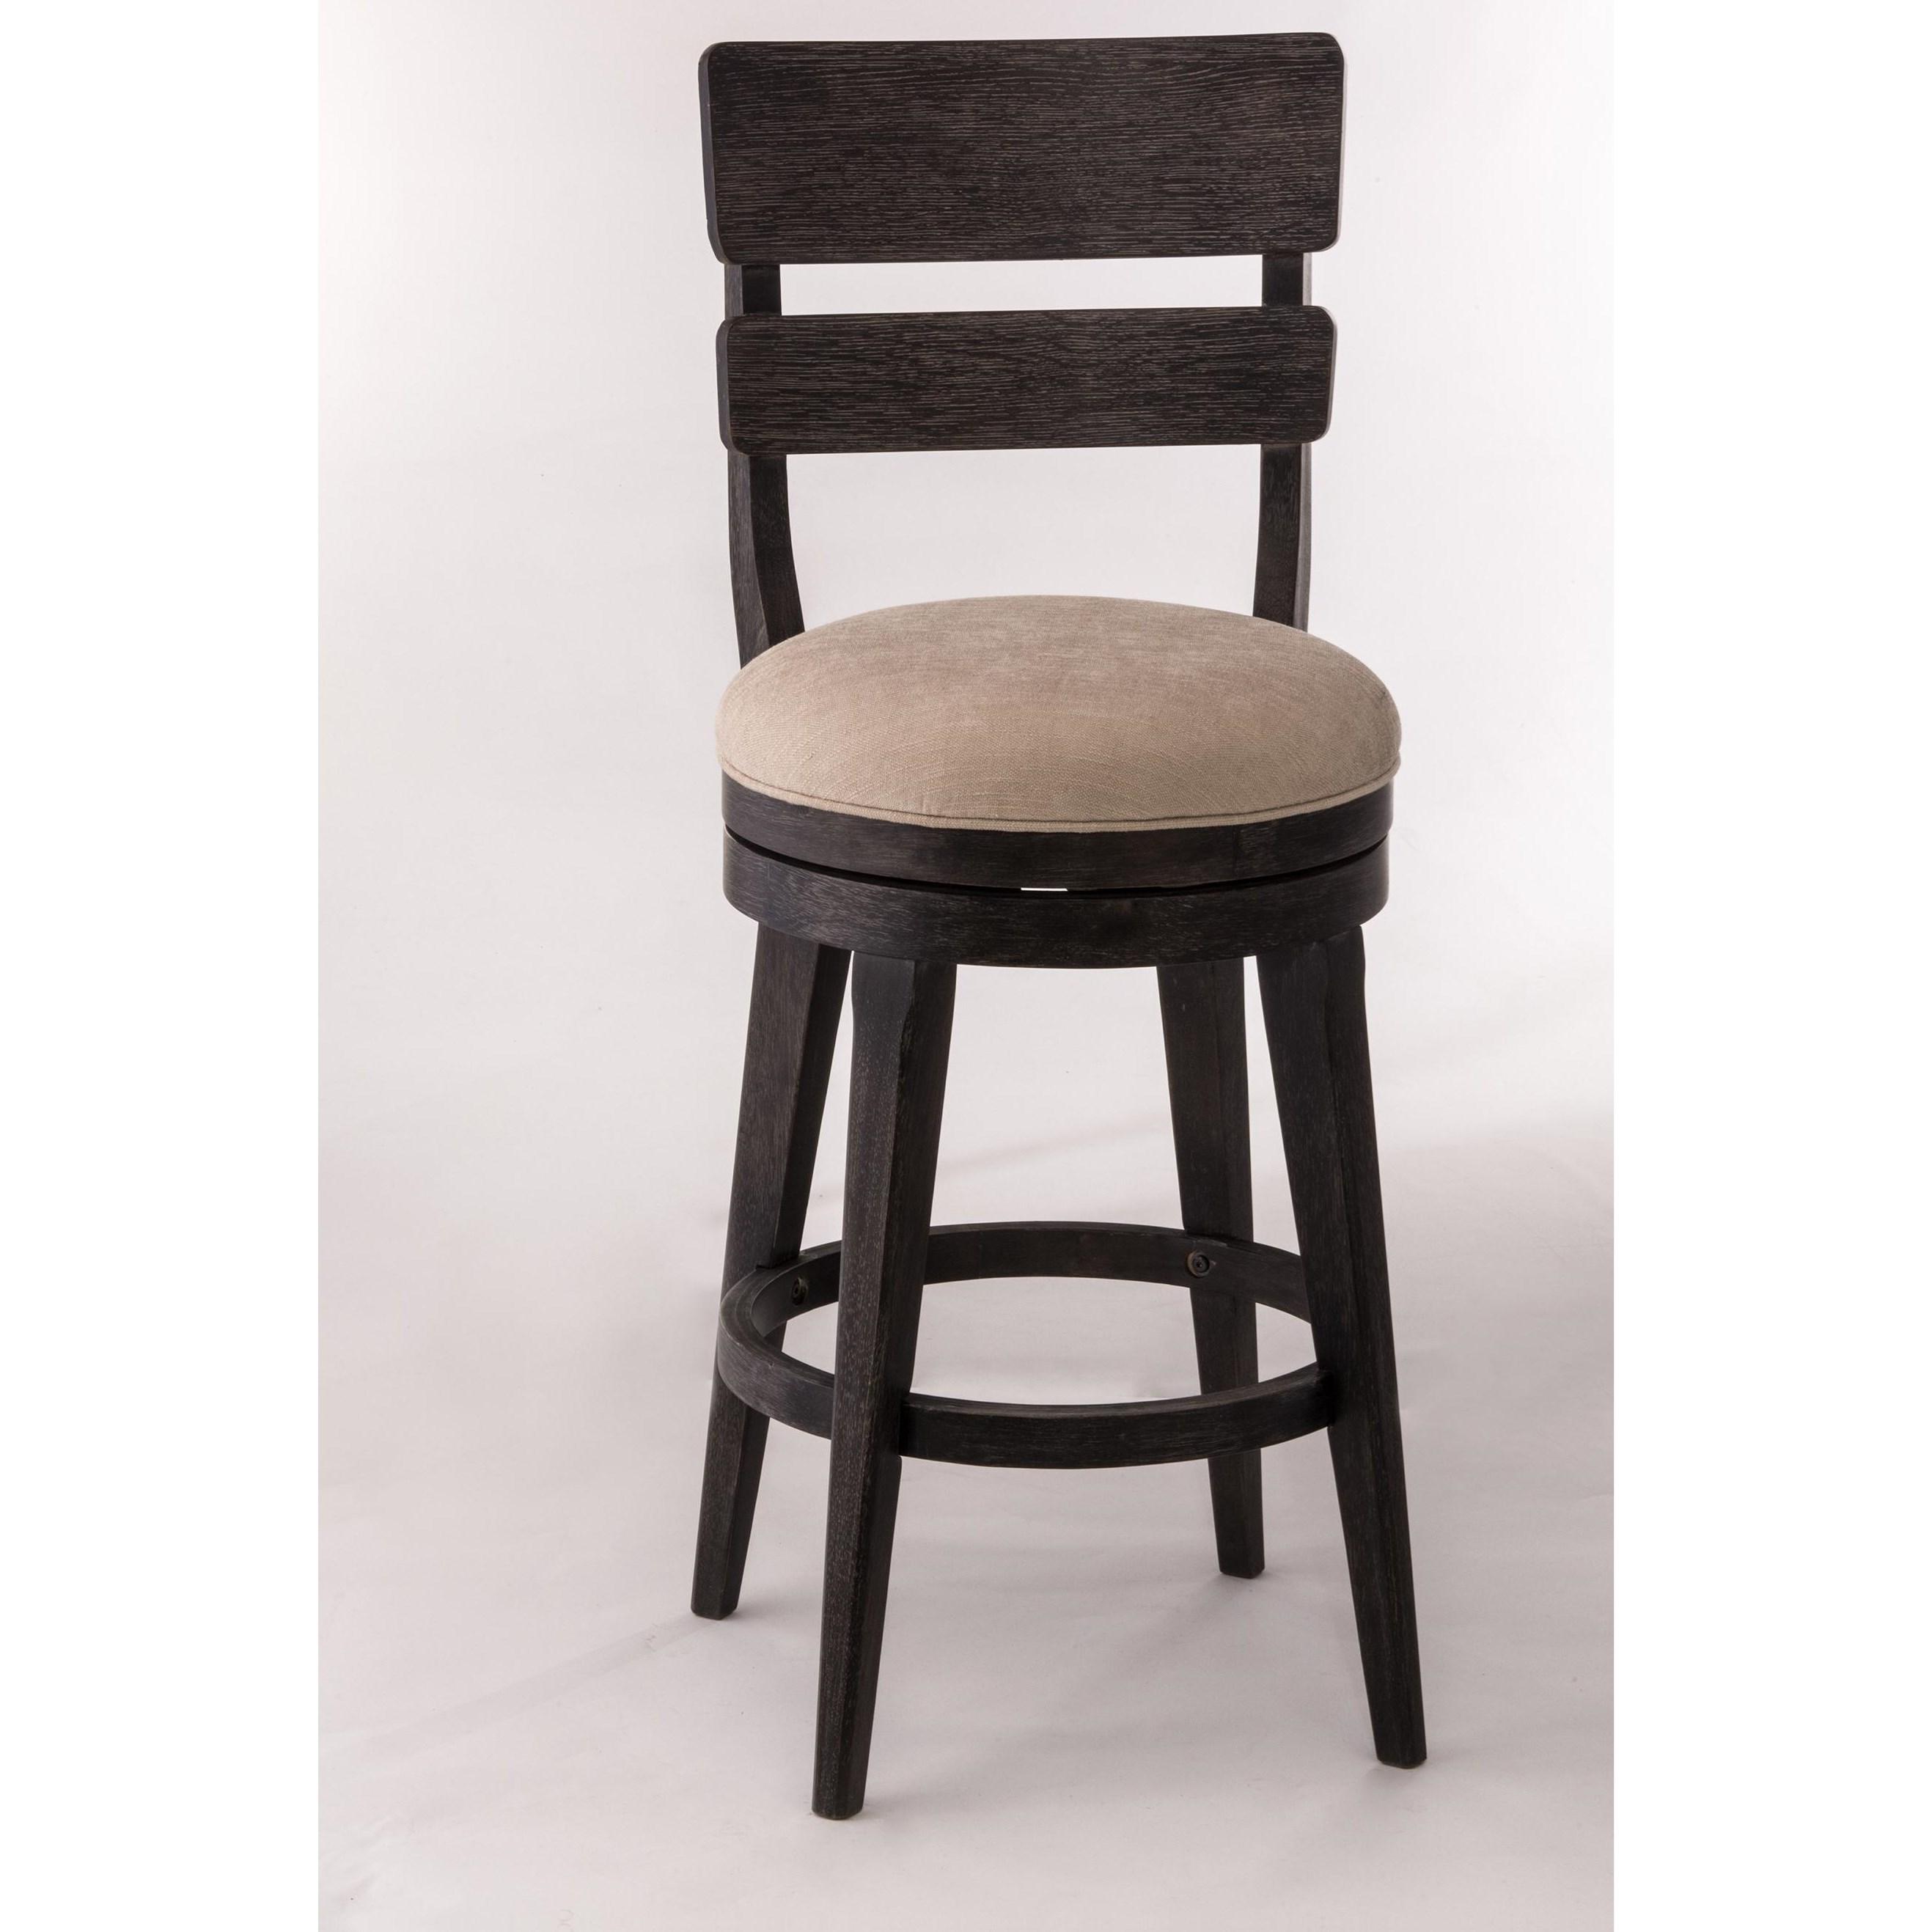 Hillsdale Wood Stools 5911 832 Upholstered Swivel Bar